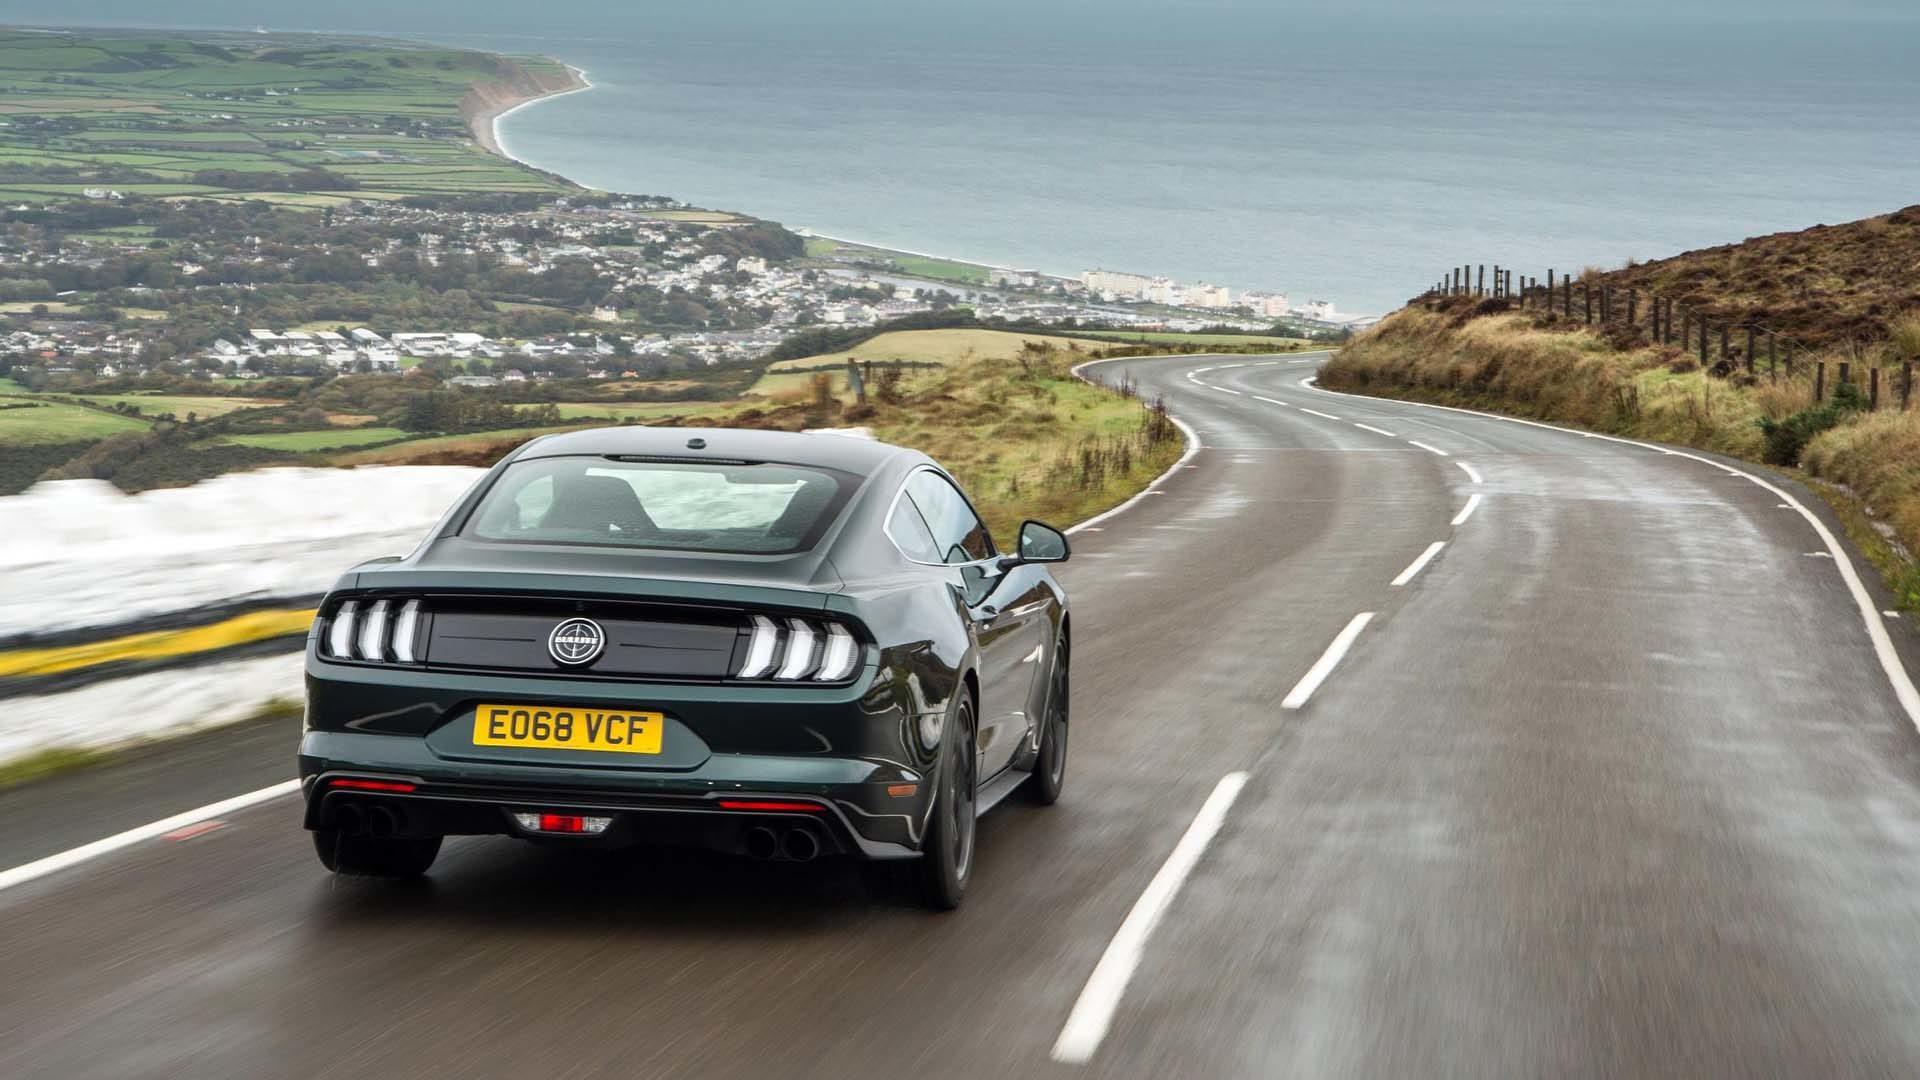 Driving on left Isle of Man